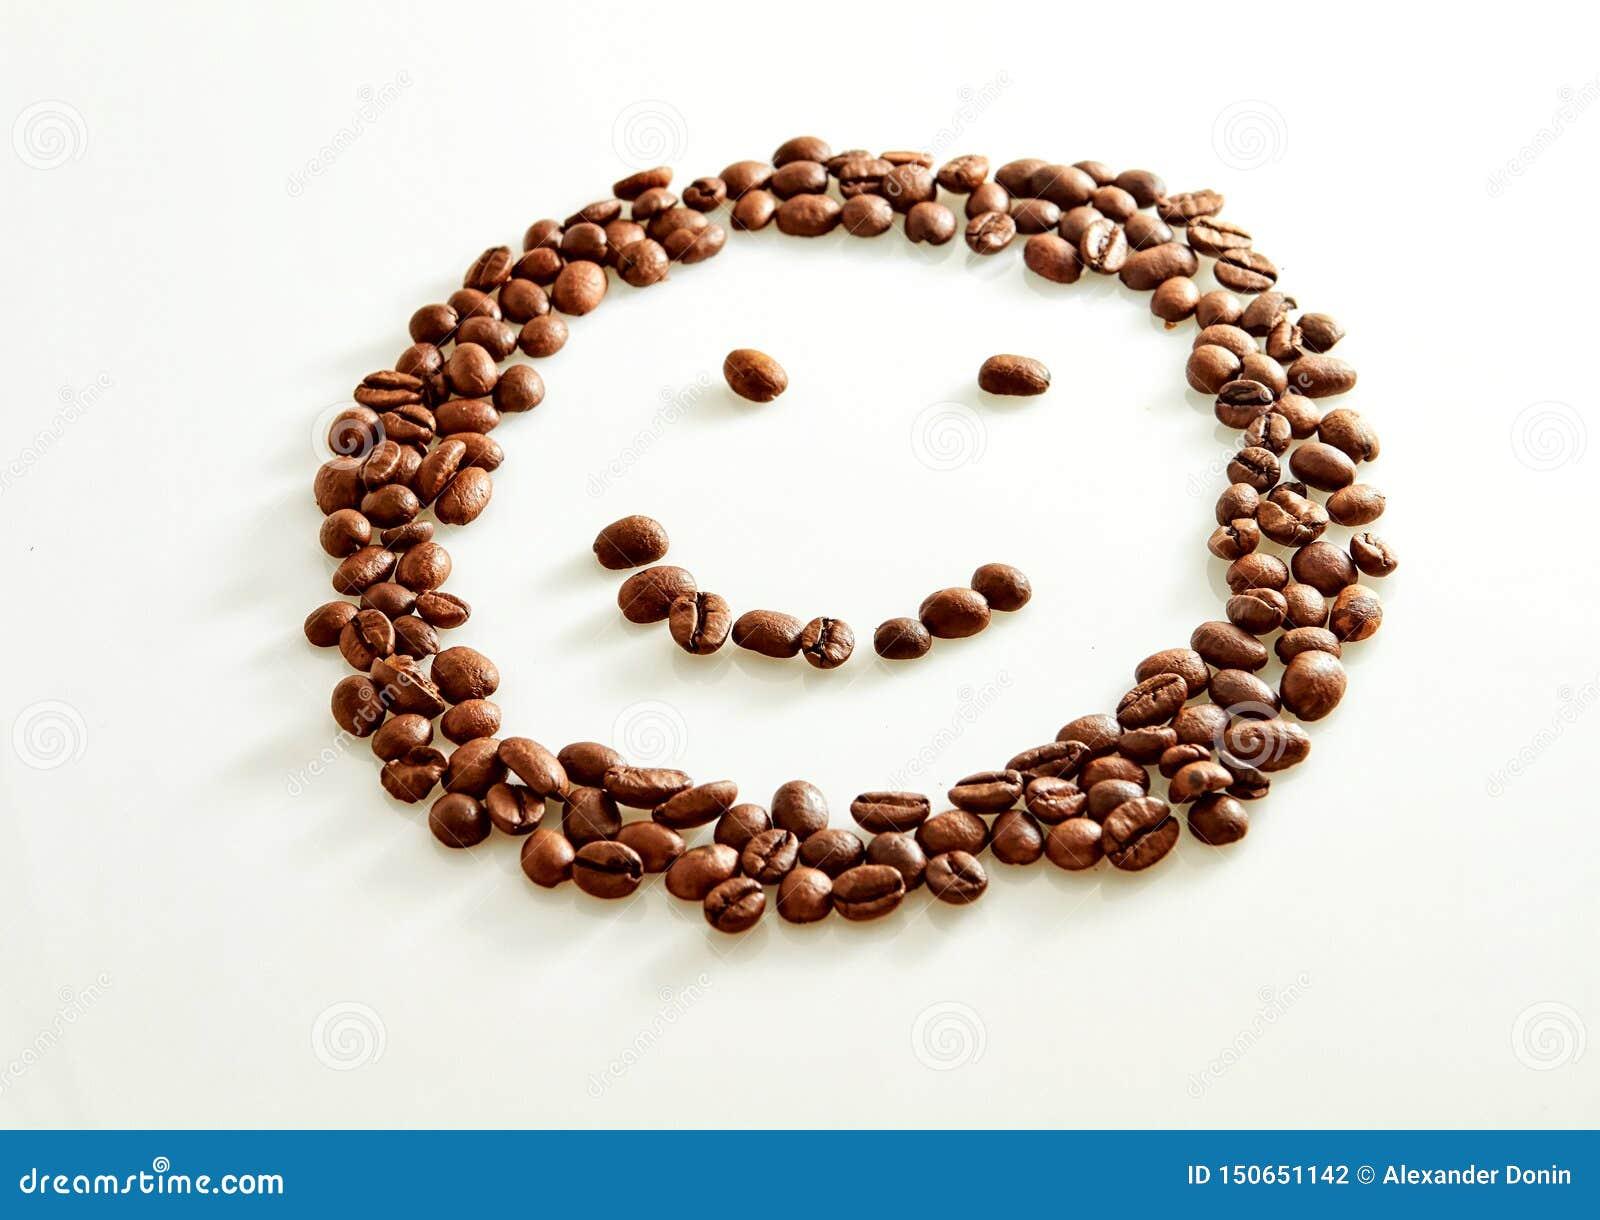 Glimlach gevormde die koffiebonen op wit worden geïsoleerd